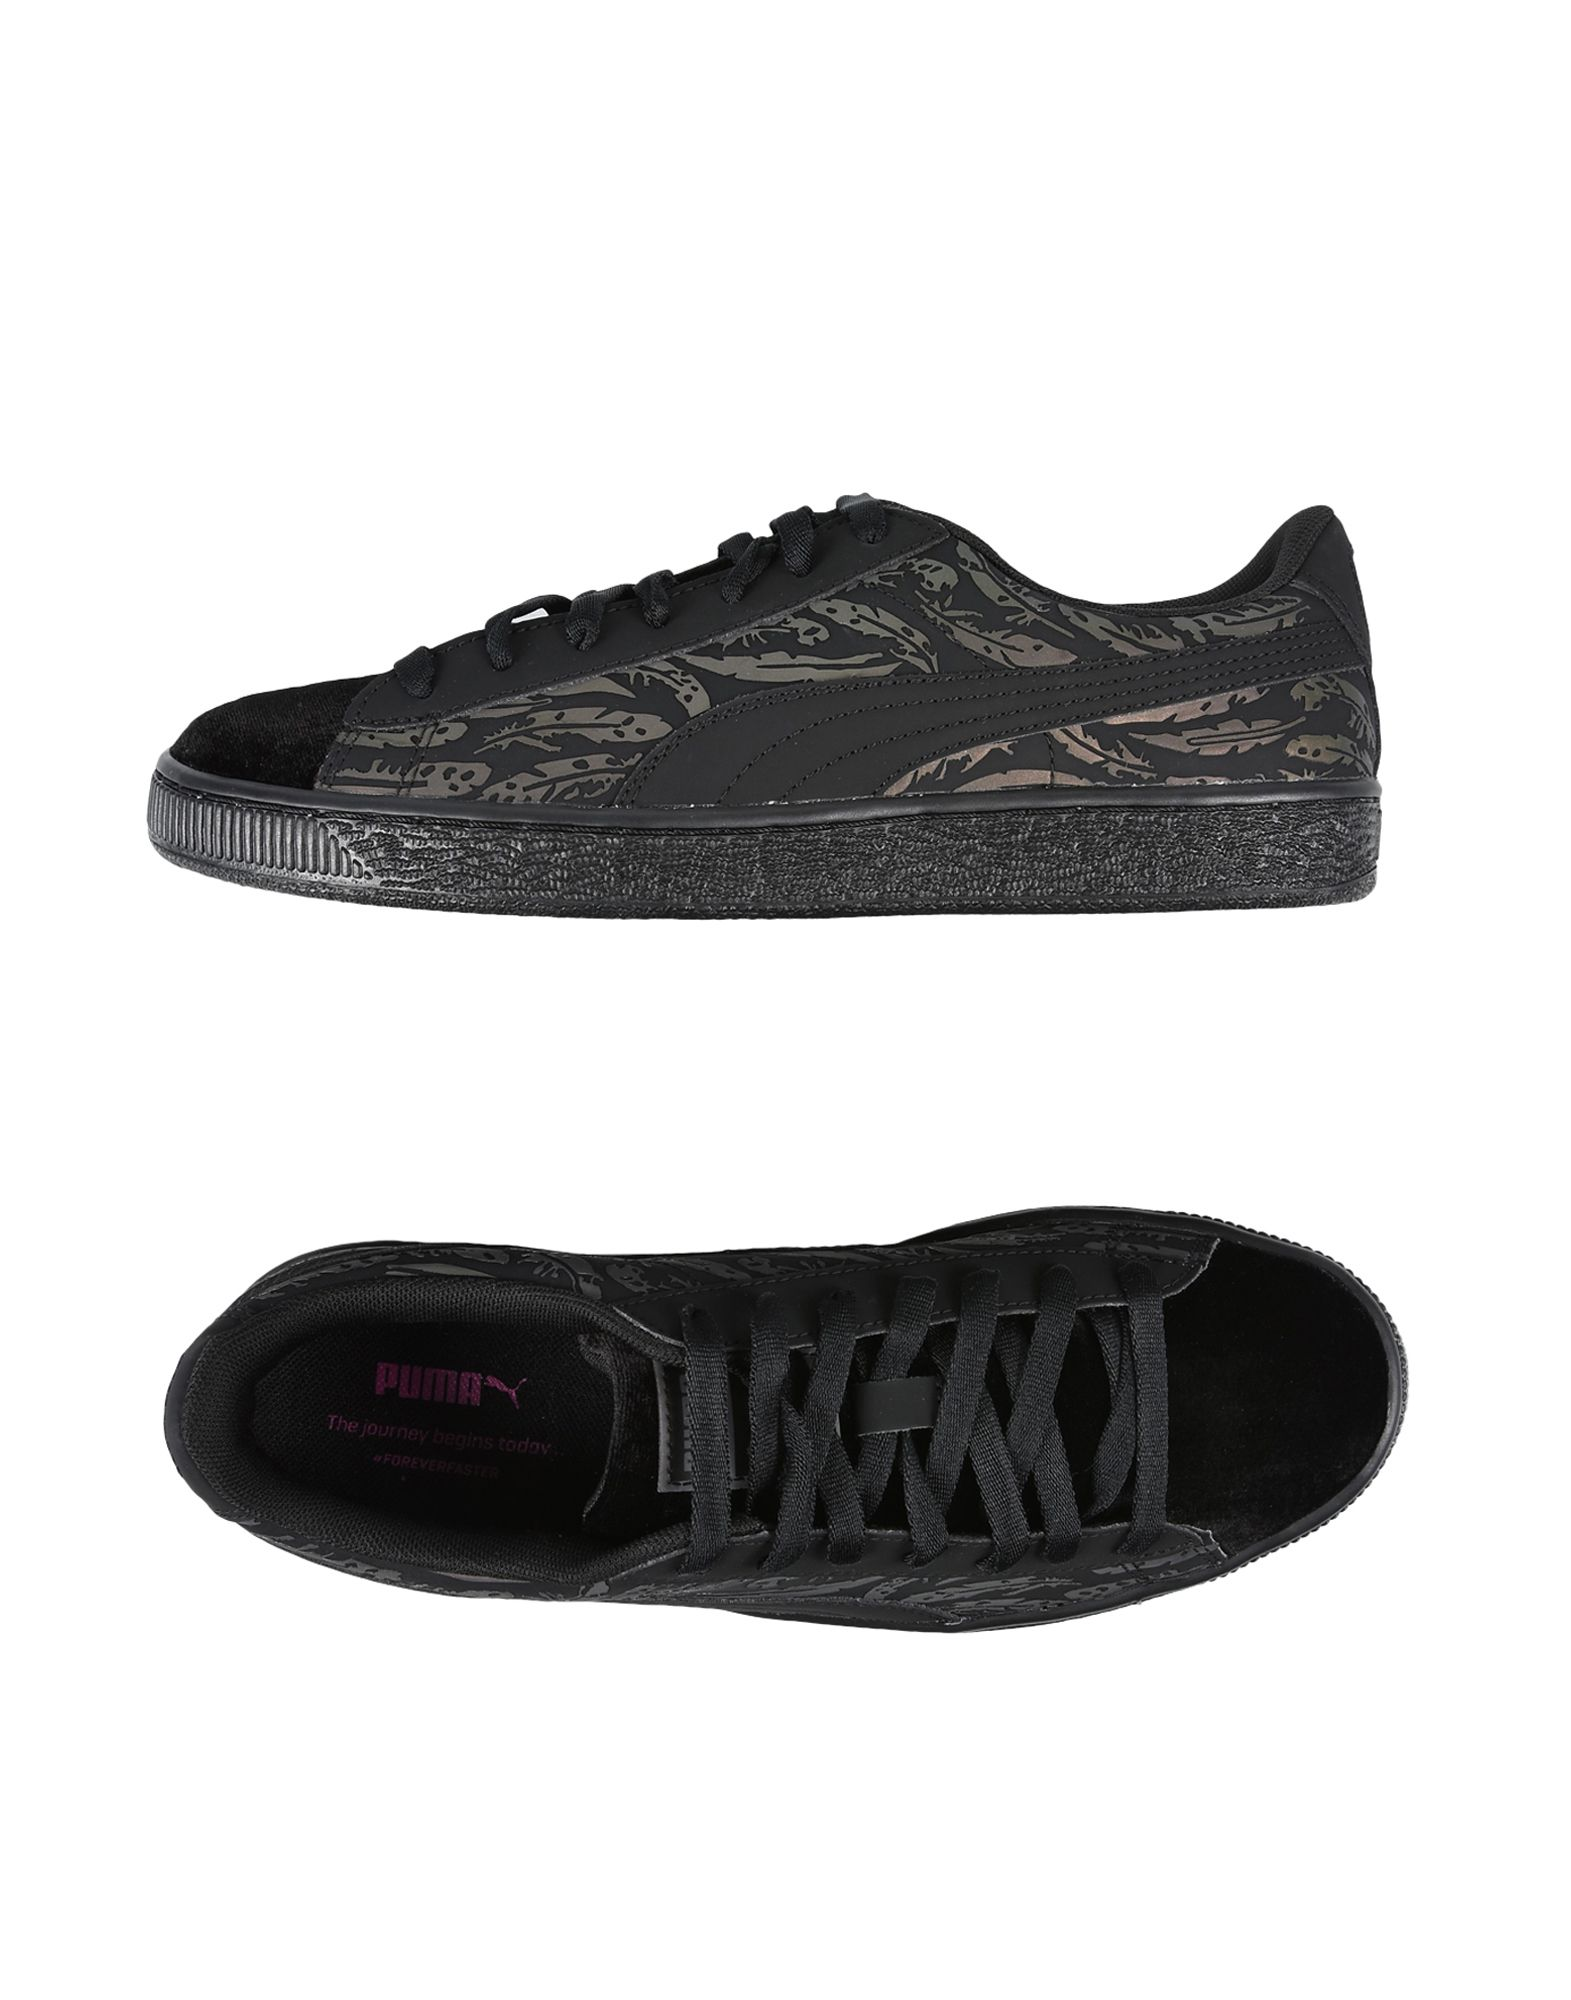 Sneakers Puma Basket Swan Wns - Femme - Sneakers Puma sur